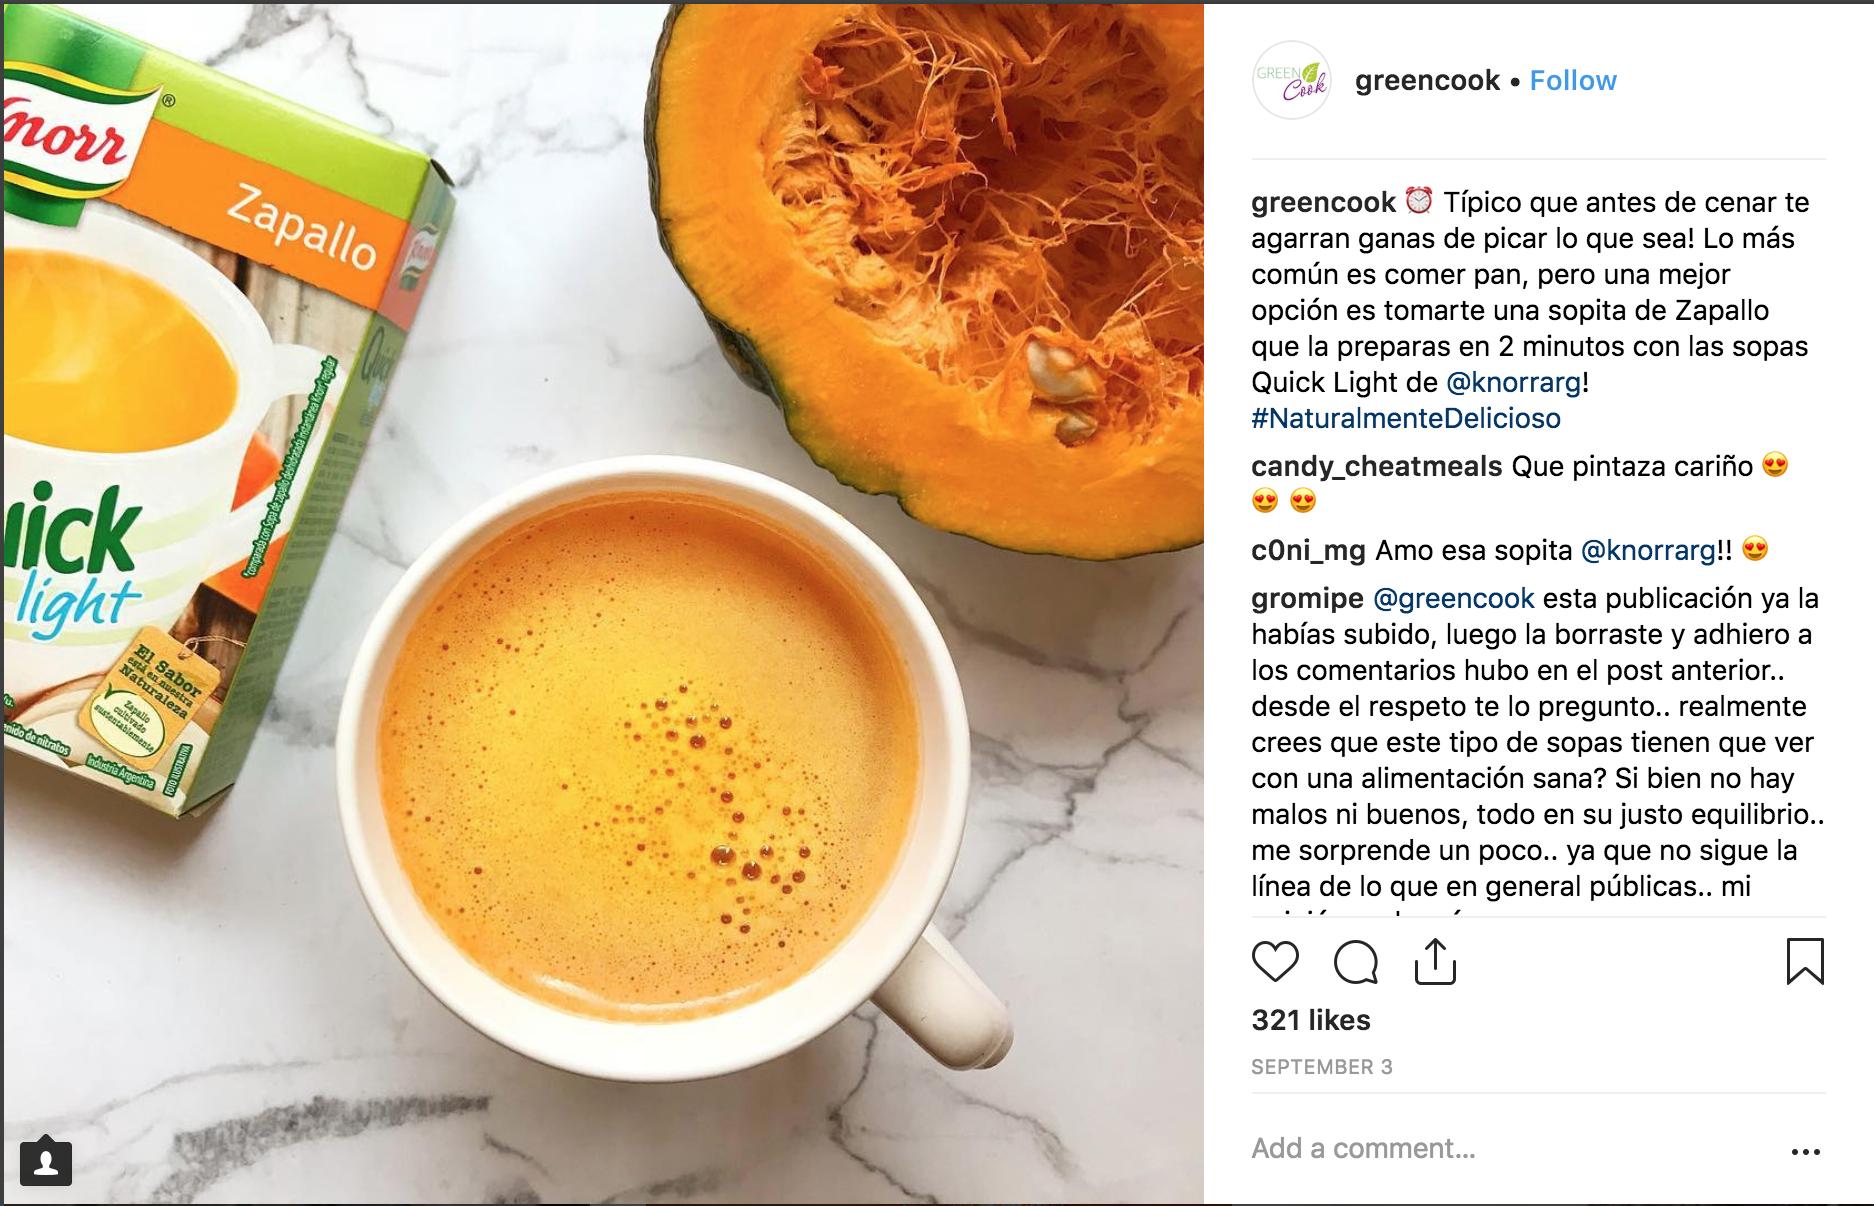 Instagram fallido greencook